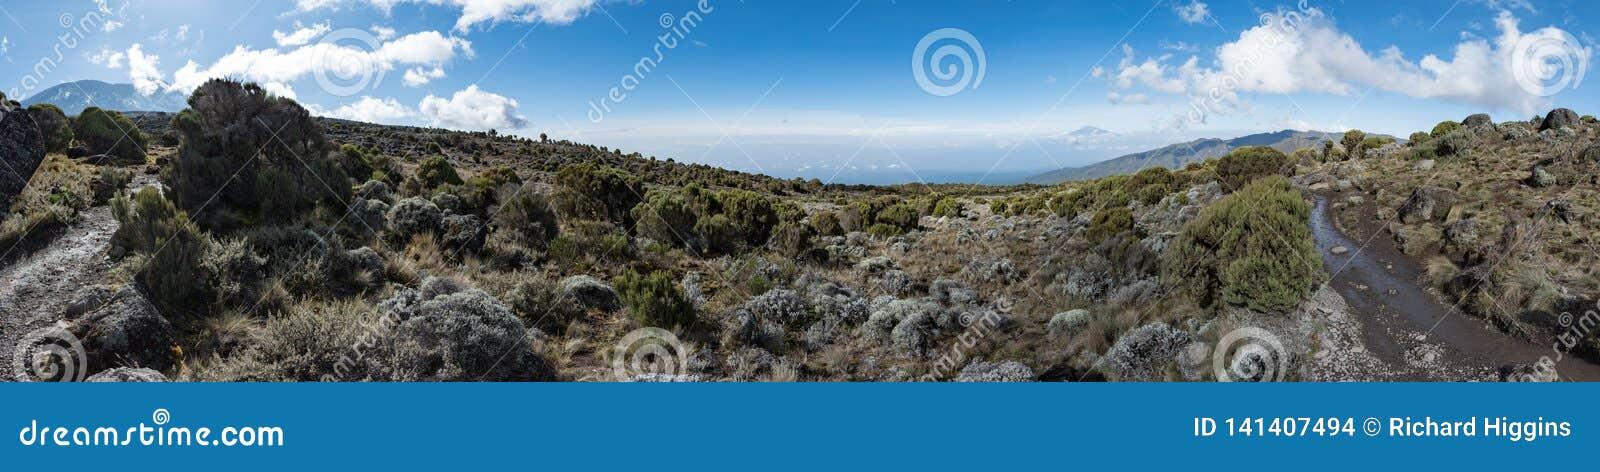 Panoramautsikt som tas i hedlandzonen av den Machame rutten på Mount Kilimanjaro